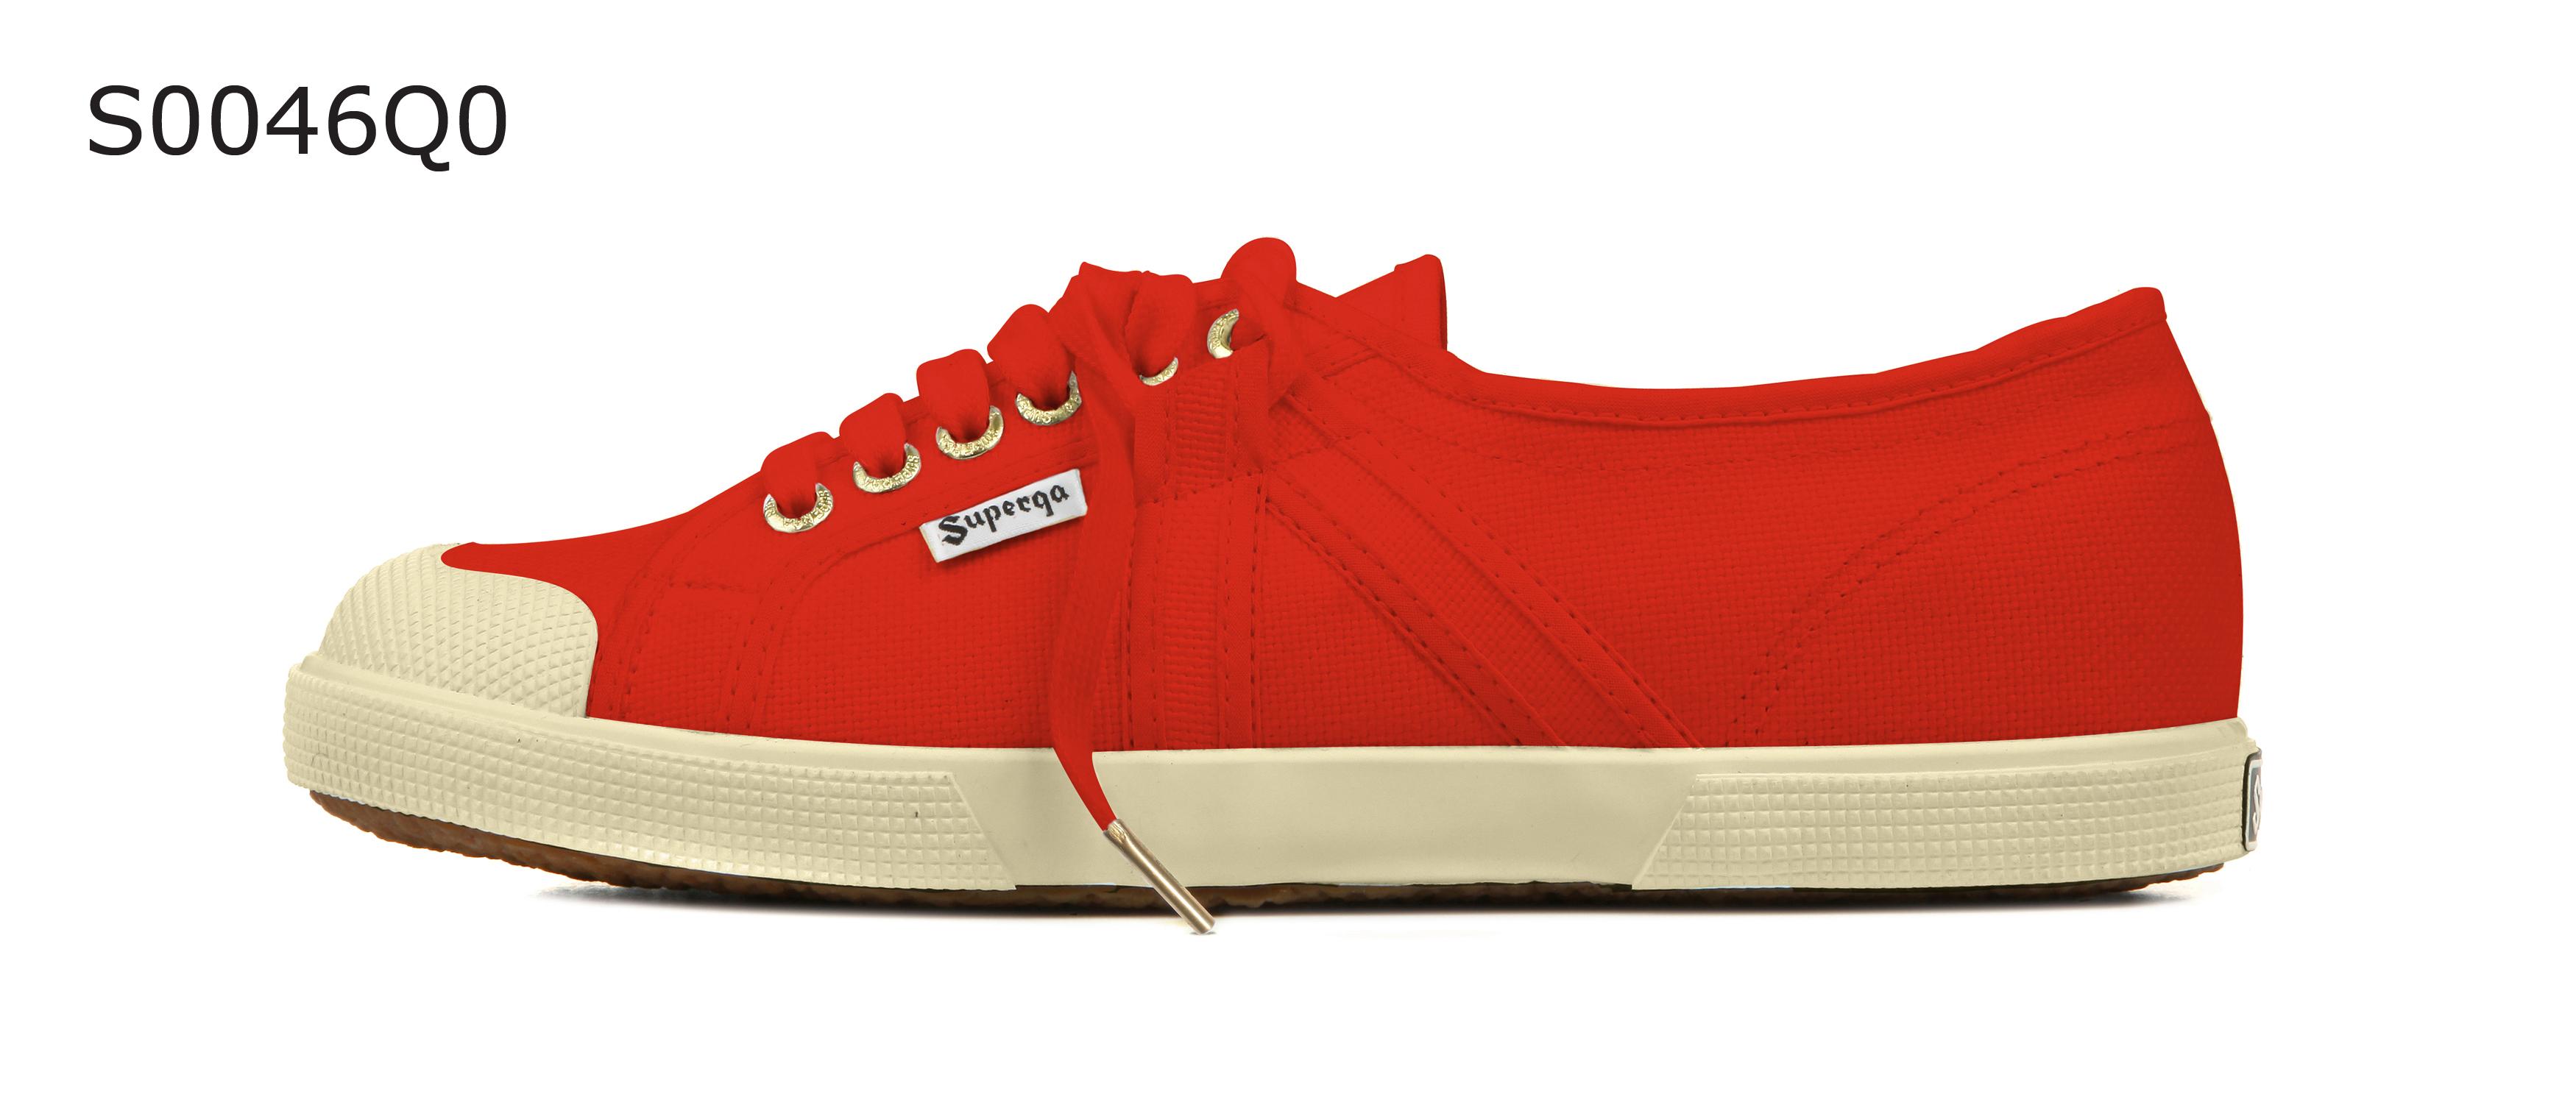 sports shoes 4f8a9 ad3e0 Superga Frauen Mnner Sneaker Gre 36373839404142434445 Eu